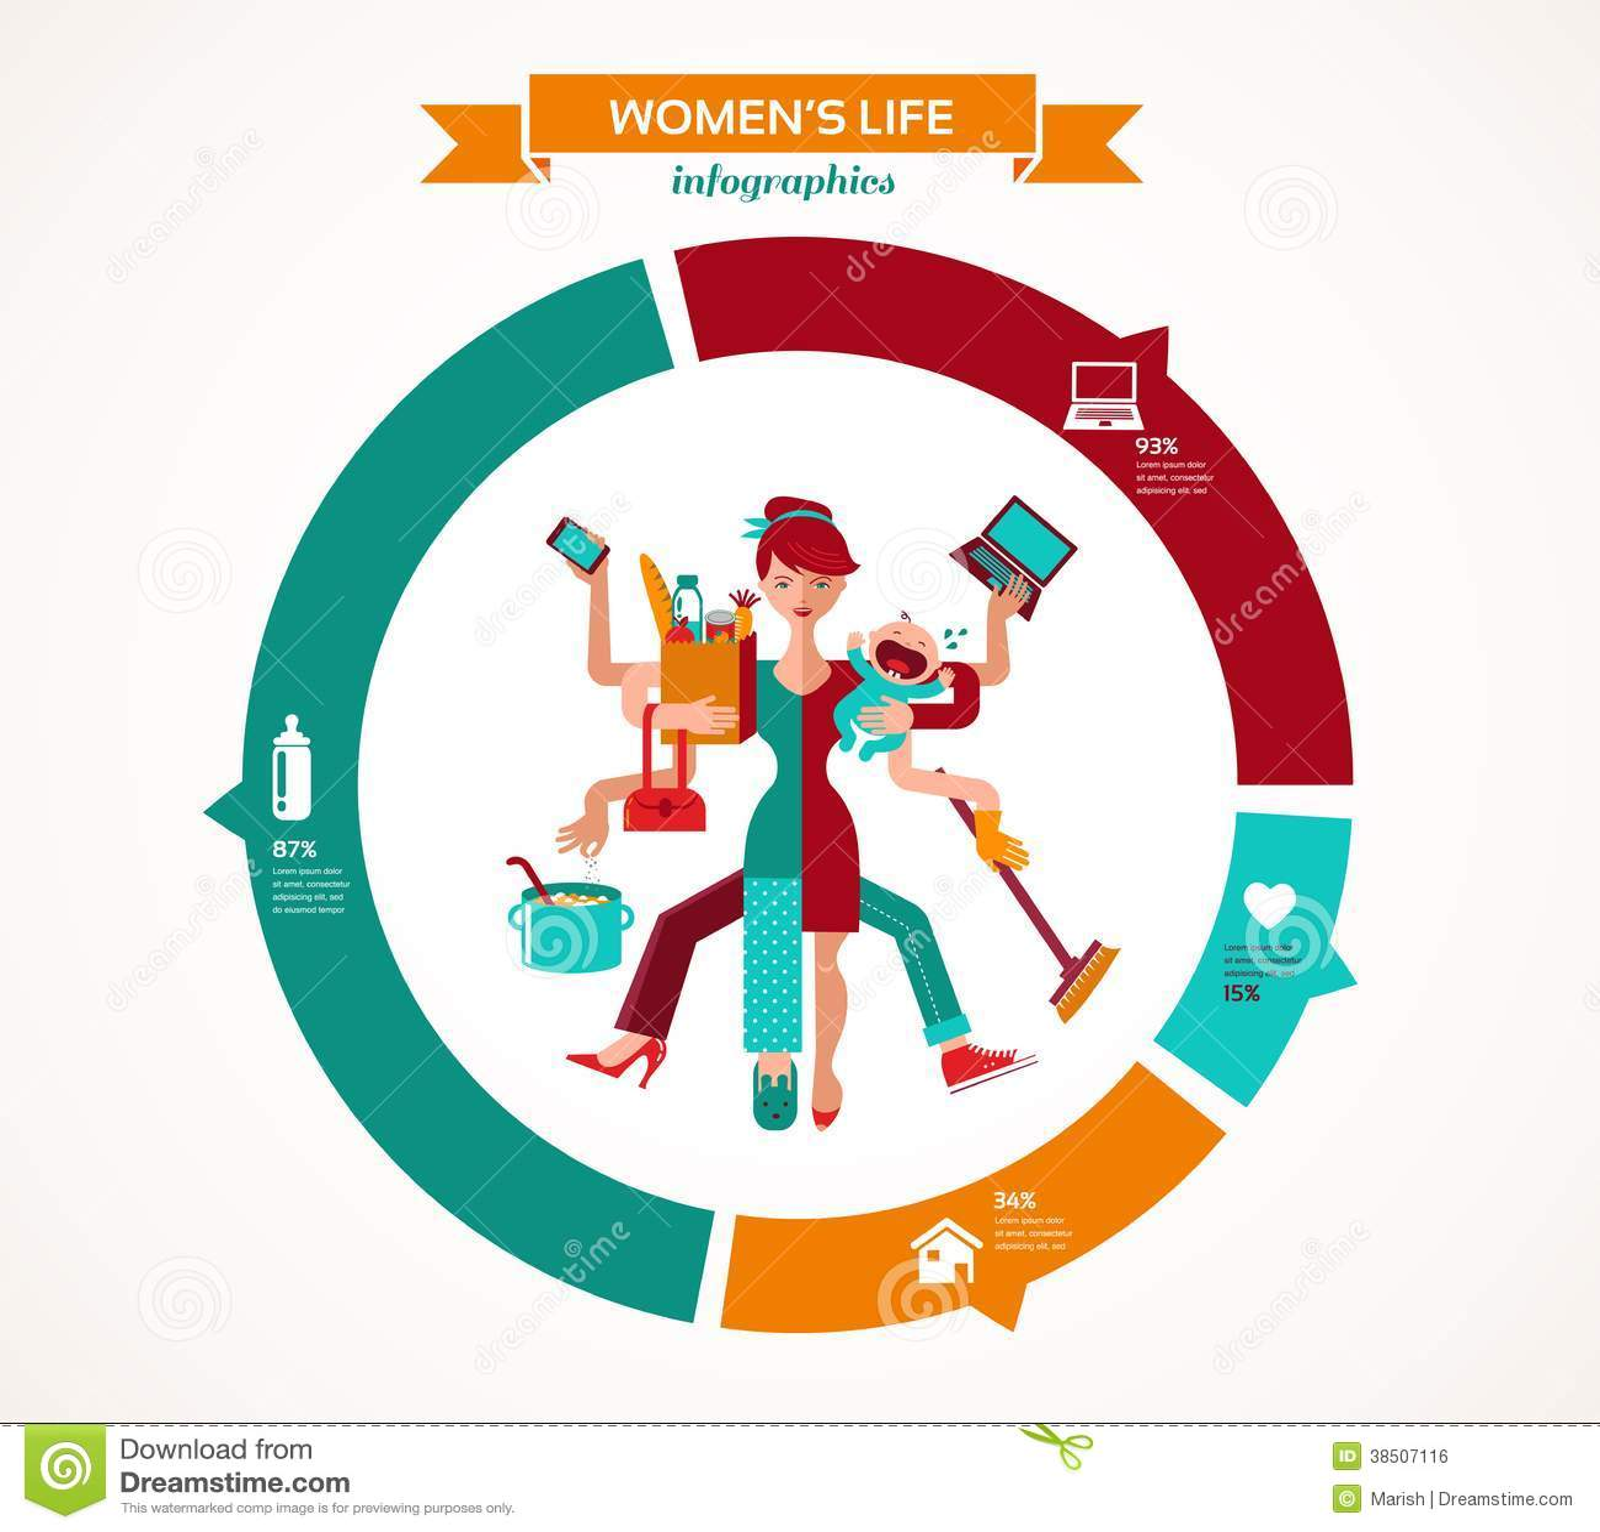 super mom infographic of multitasking mother royalty free stock image image 38507116 superhero vector clipart superhero vector art